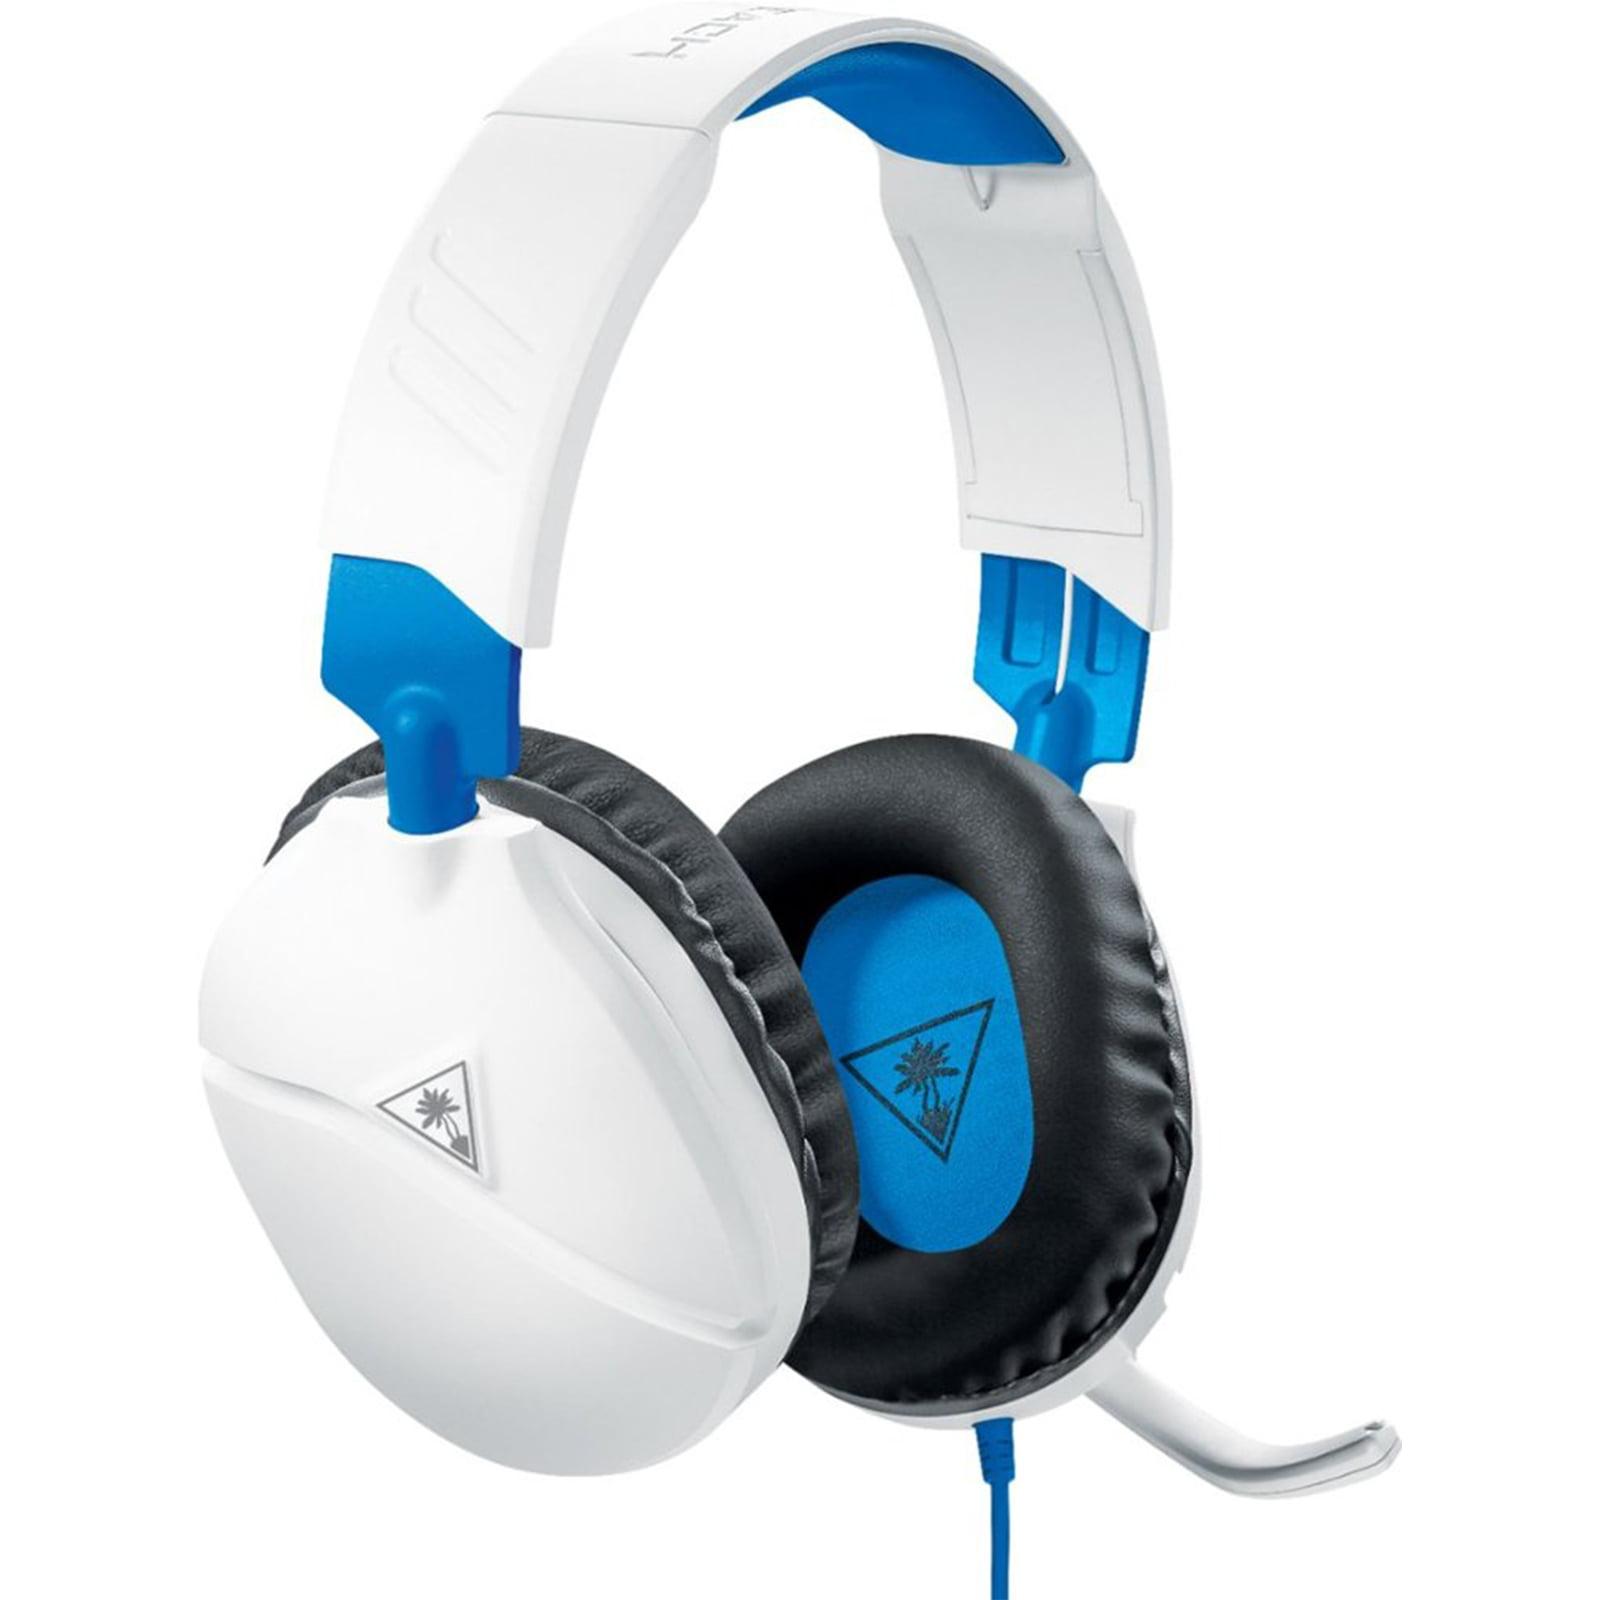 Recon 70 Headset For Ps4 Pro Ps4 White Walmart Com Walmart Com